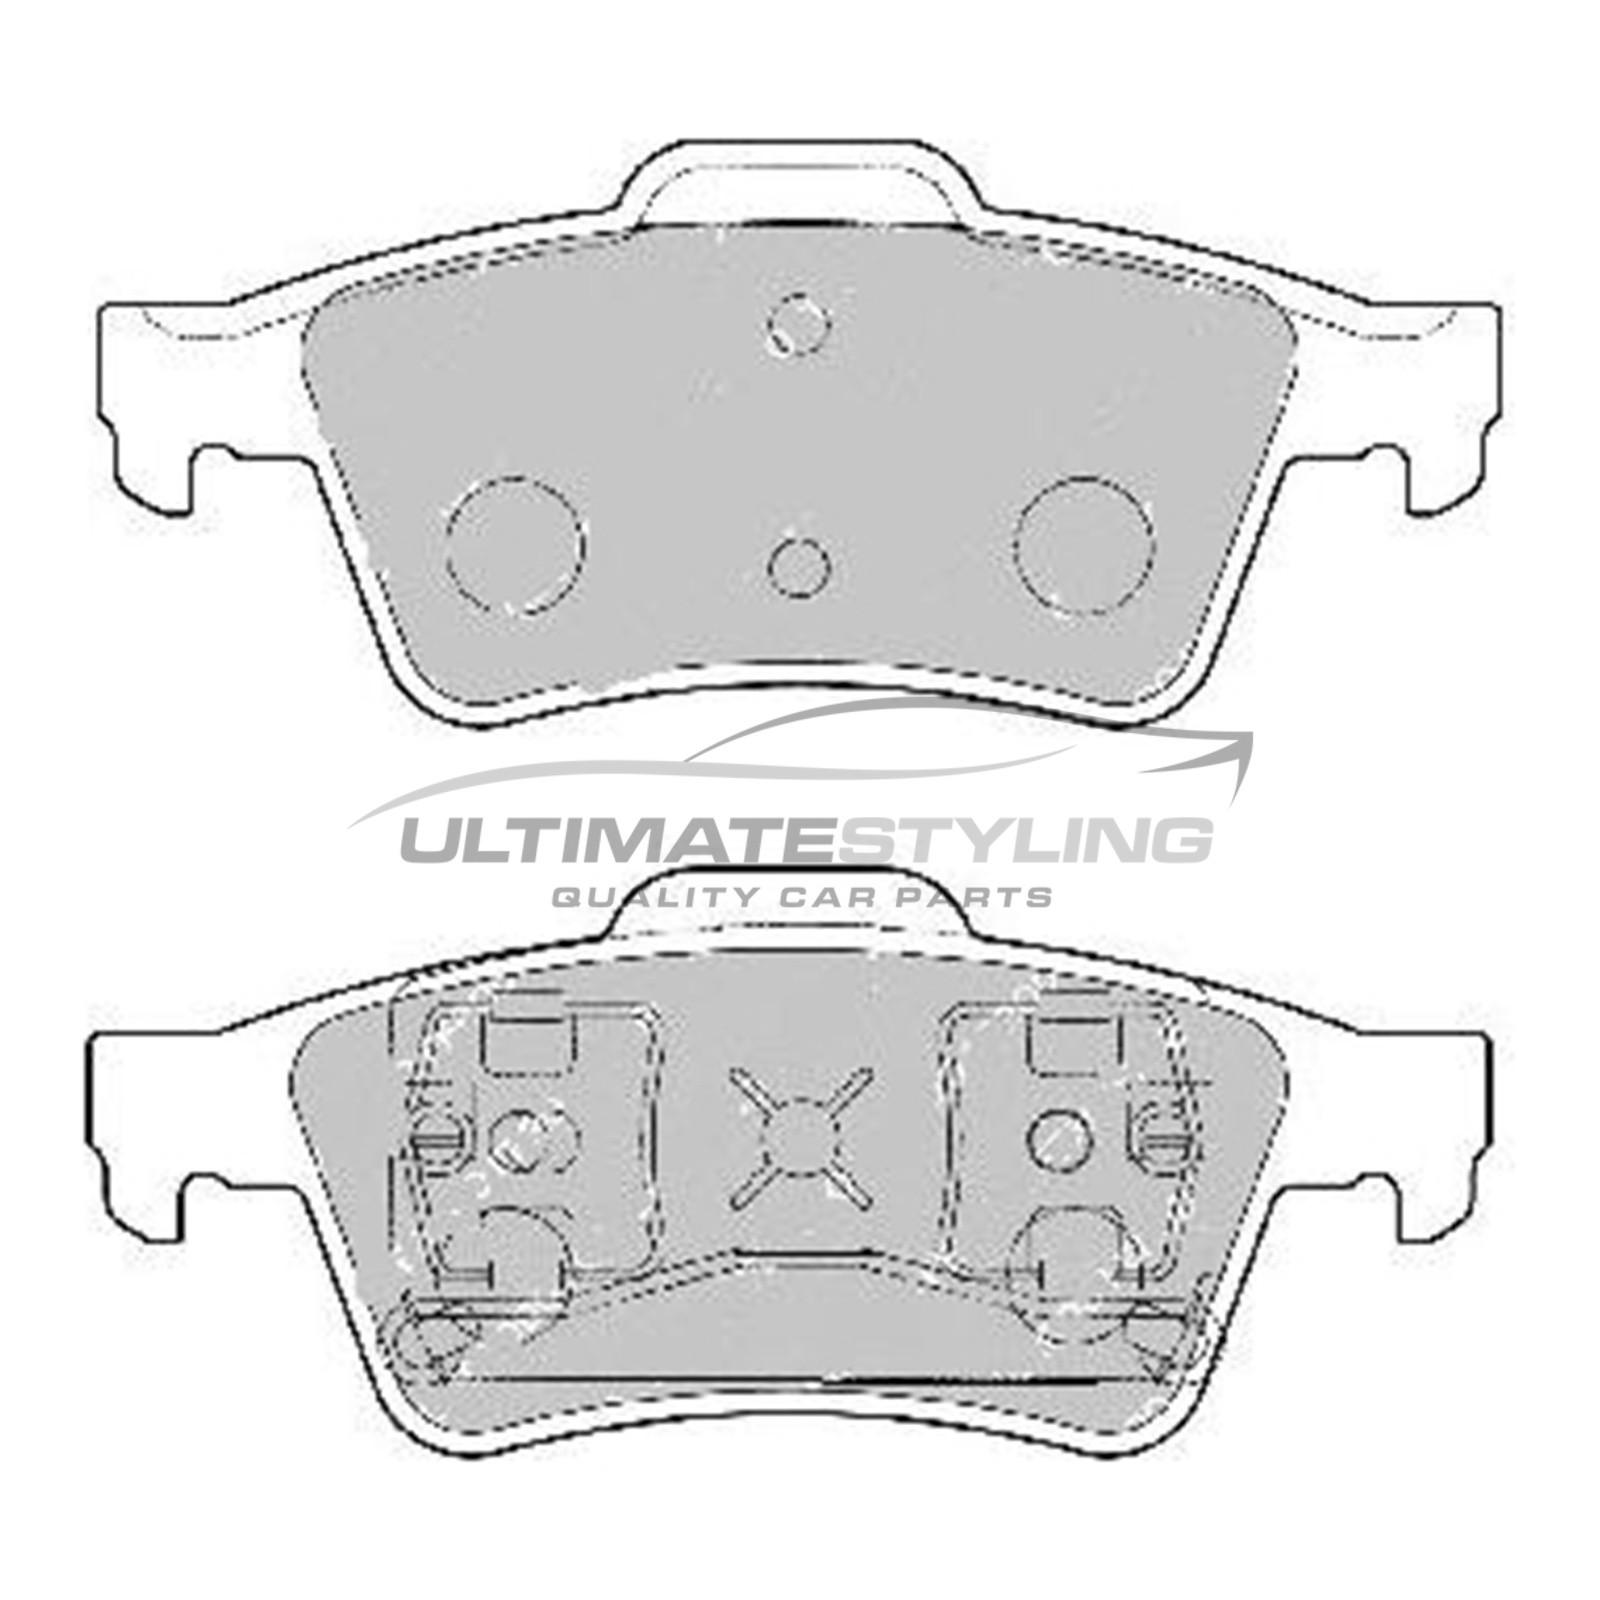 Nissan Primera, Renault Espace / Laguna / Megane / Vel Satis, Saab 9-3, Vauxhall Signum / Vectra Brake Pads - Rear